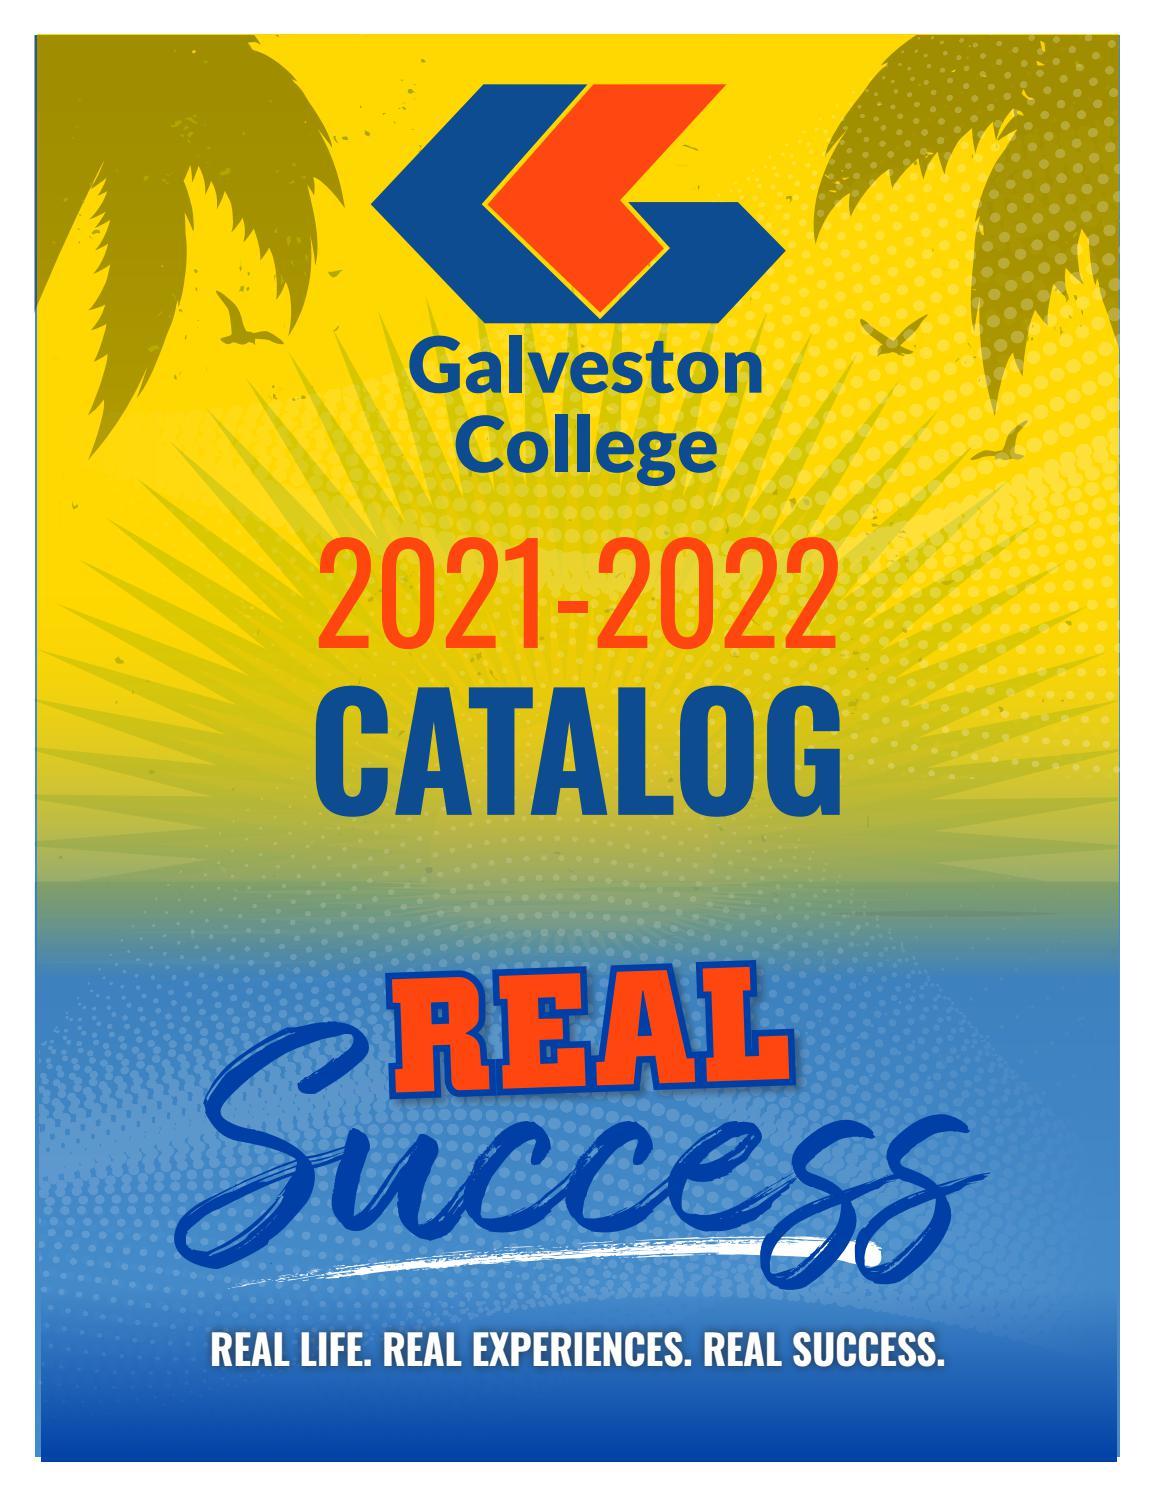 Ualbany Academic Calendar Fall 2022.Galveston College 2021 2022 Catalog By Gc Public Affairs Issuu